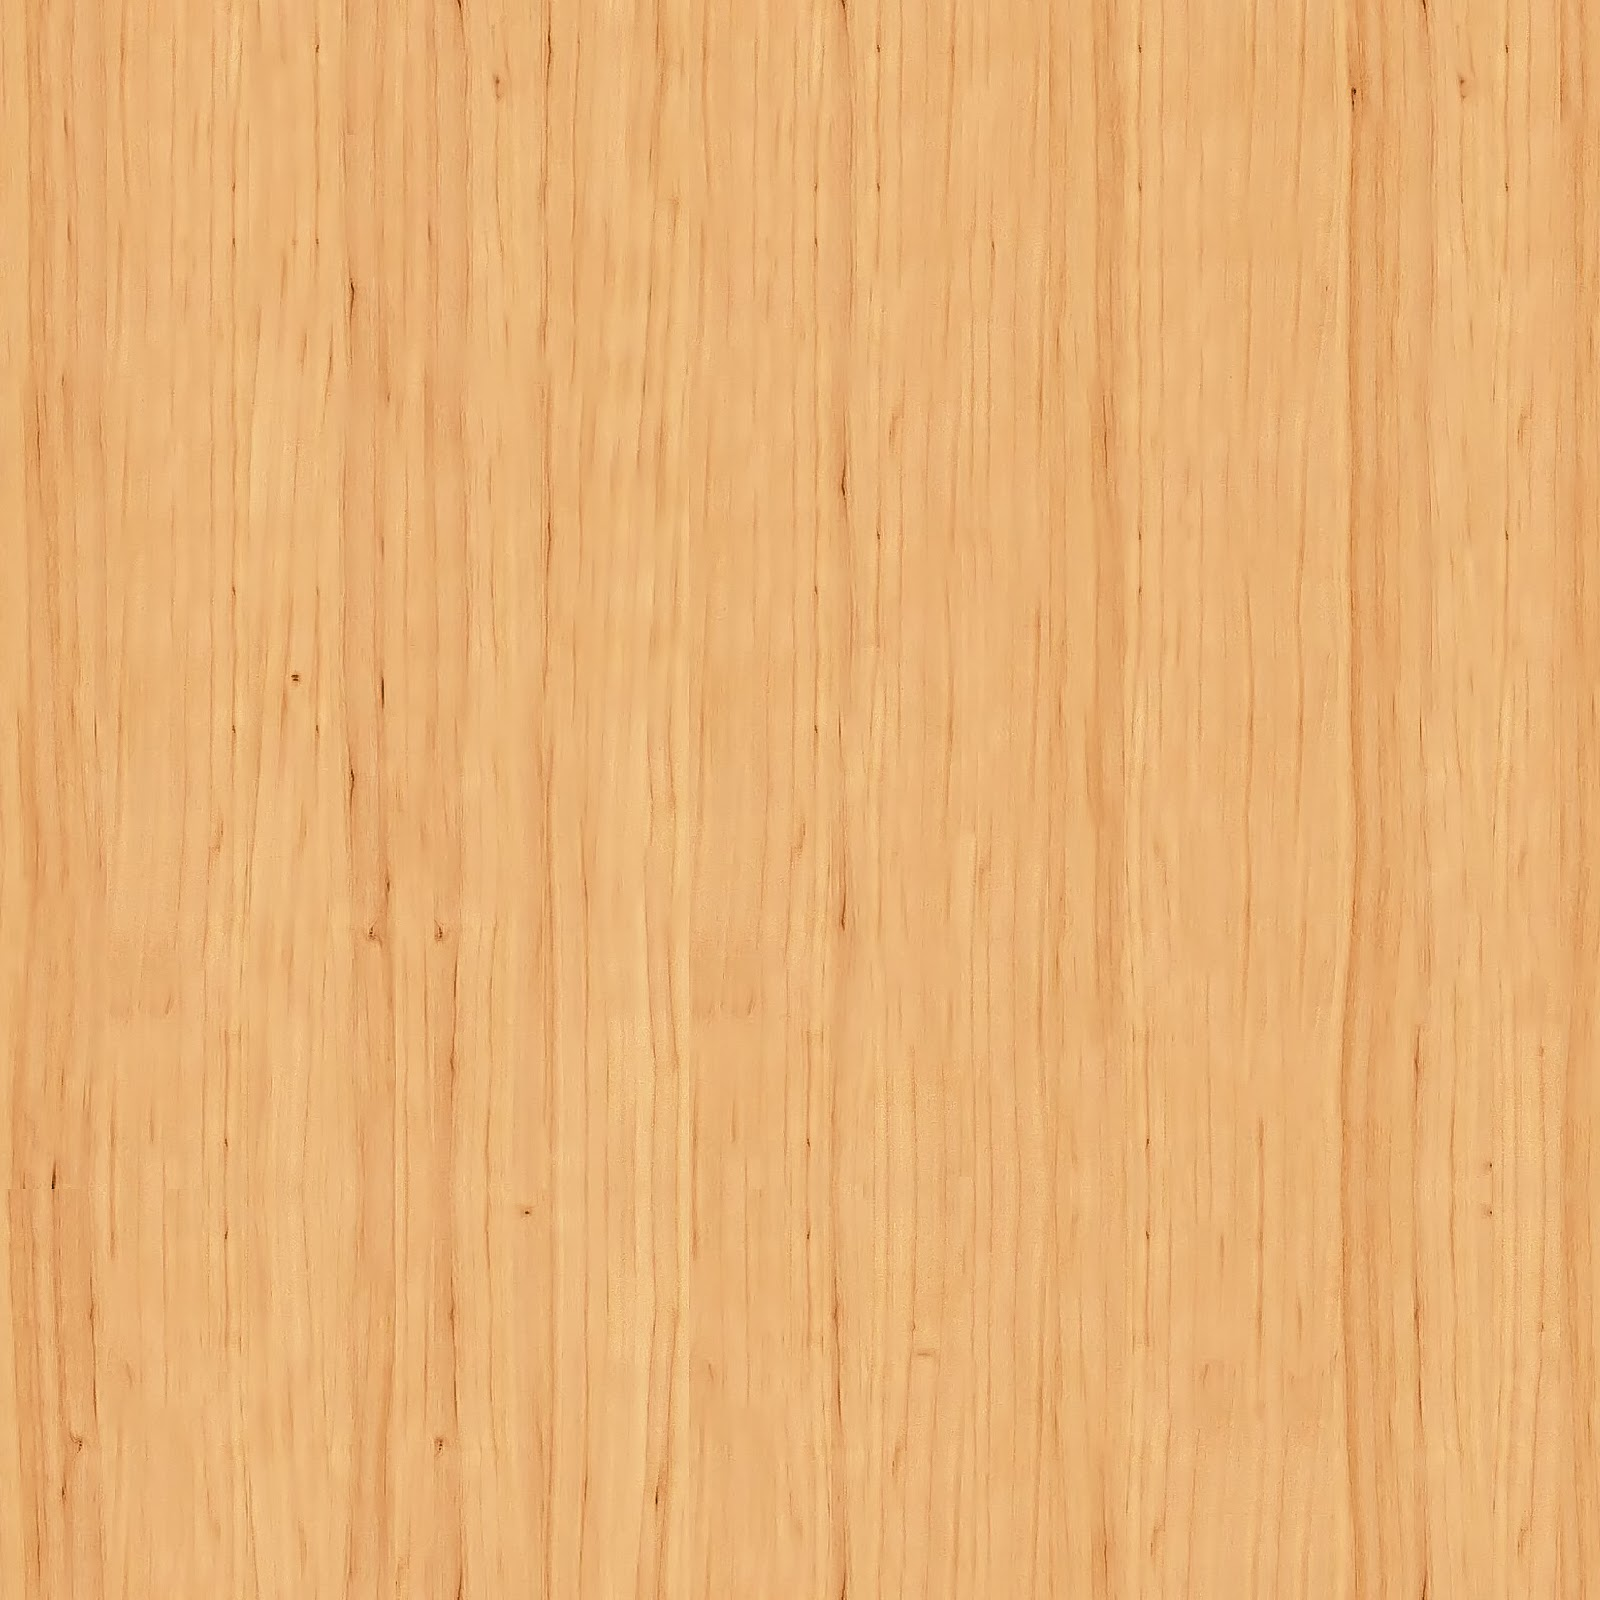 Tileable Fine Wood Texture Maps Texturise Free